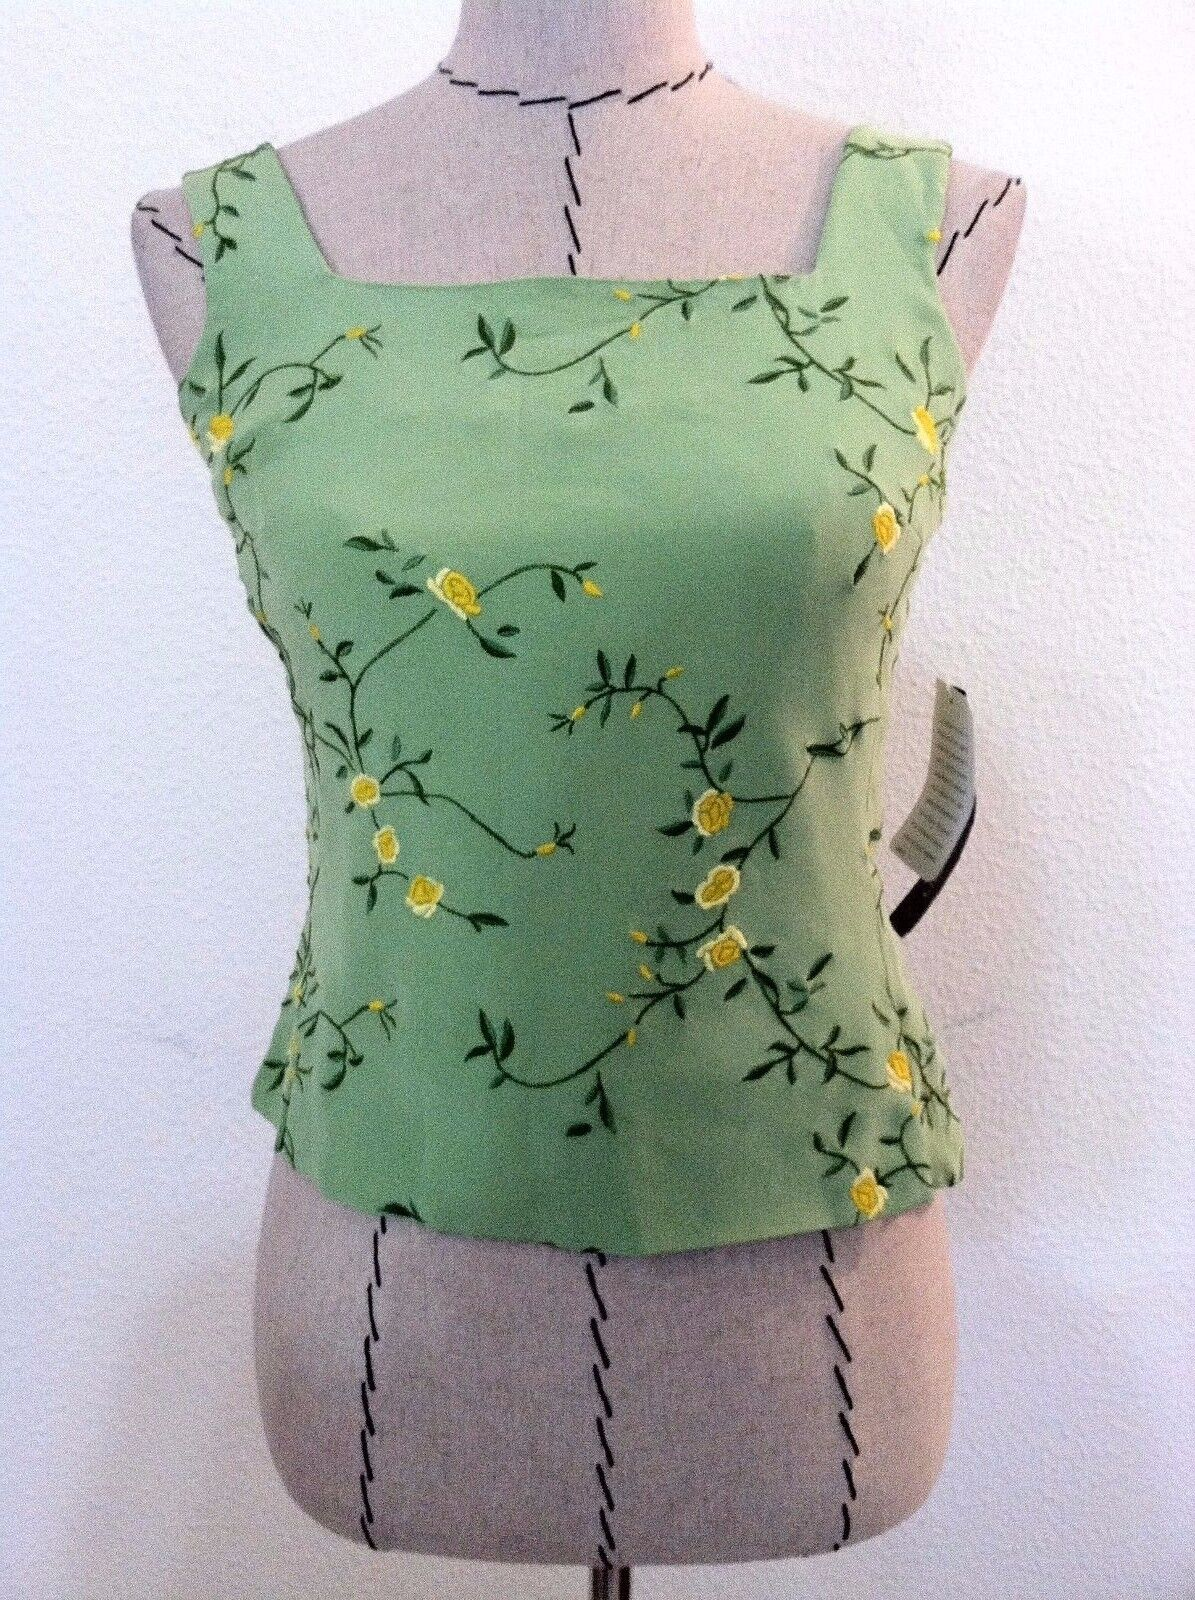 New Rena Rowan woman top 100% silk Grün Gelb floral embroid Größe 4P petite